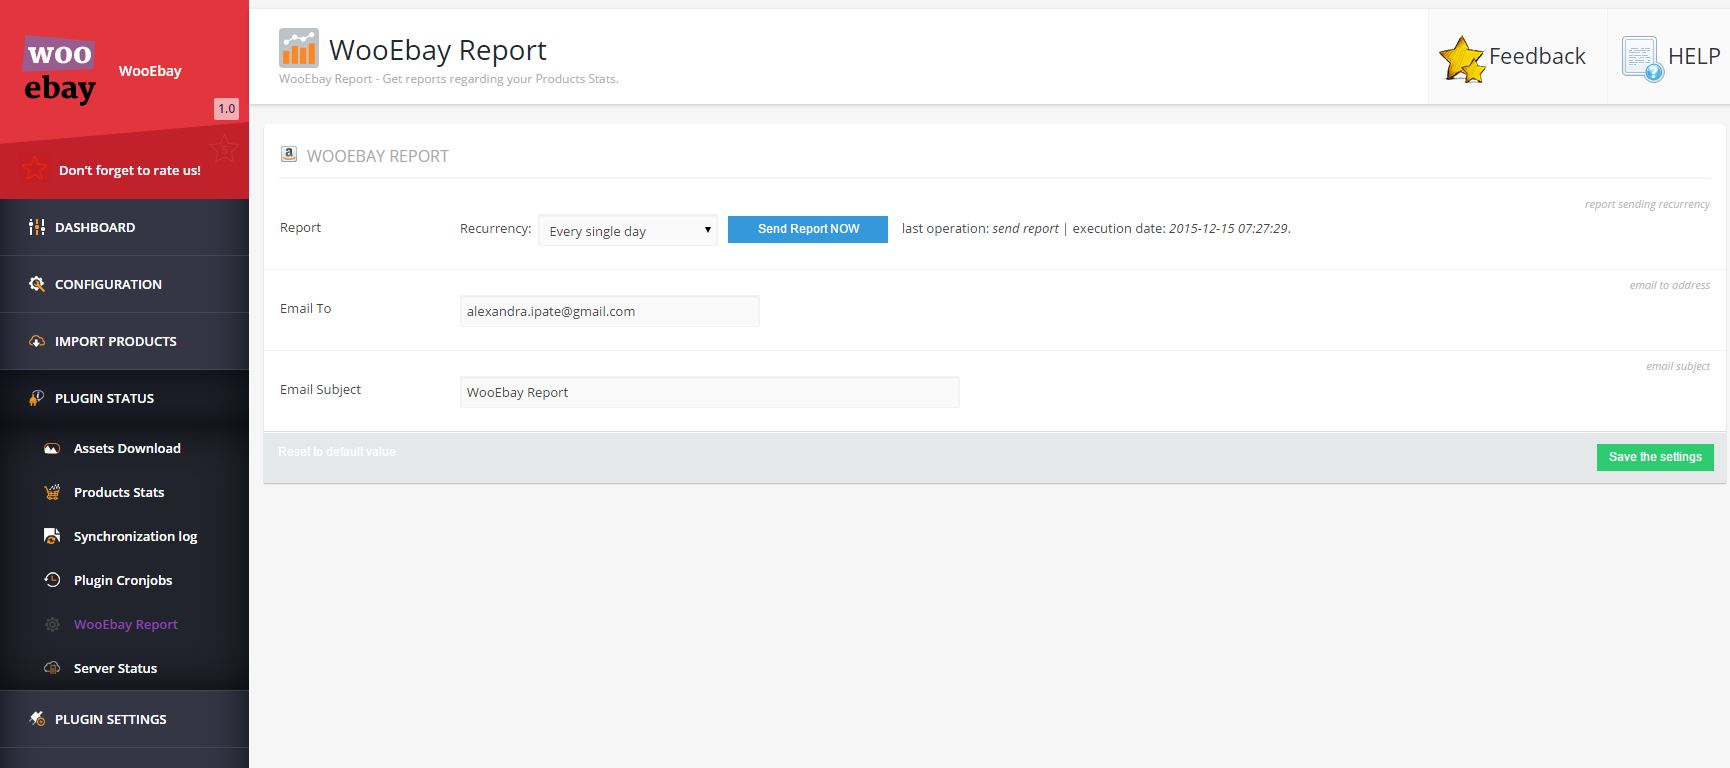 wooebay-report-3